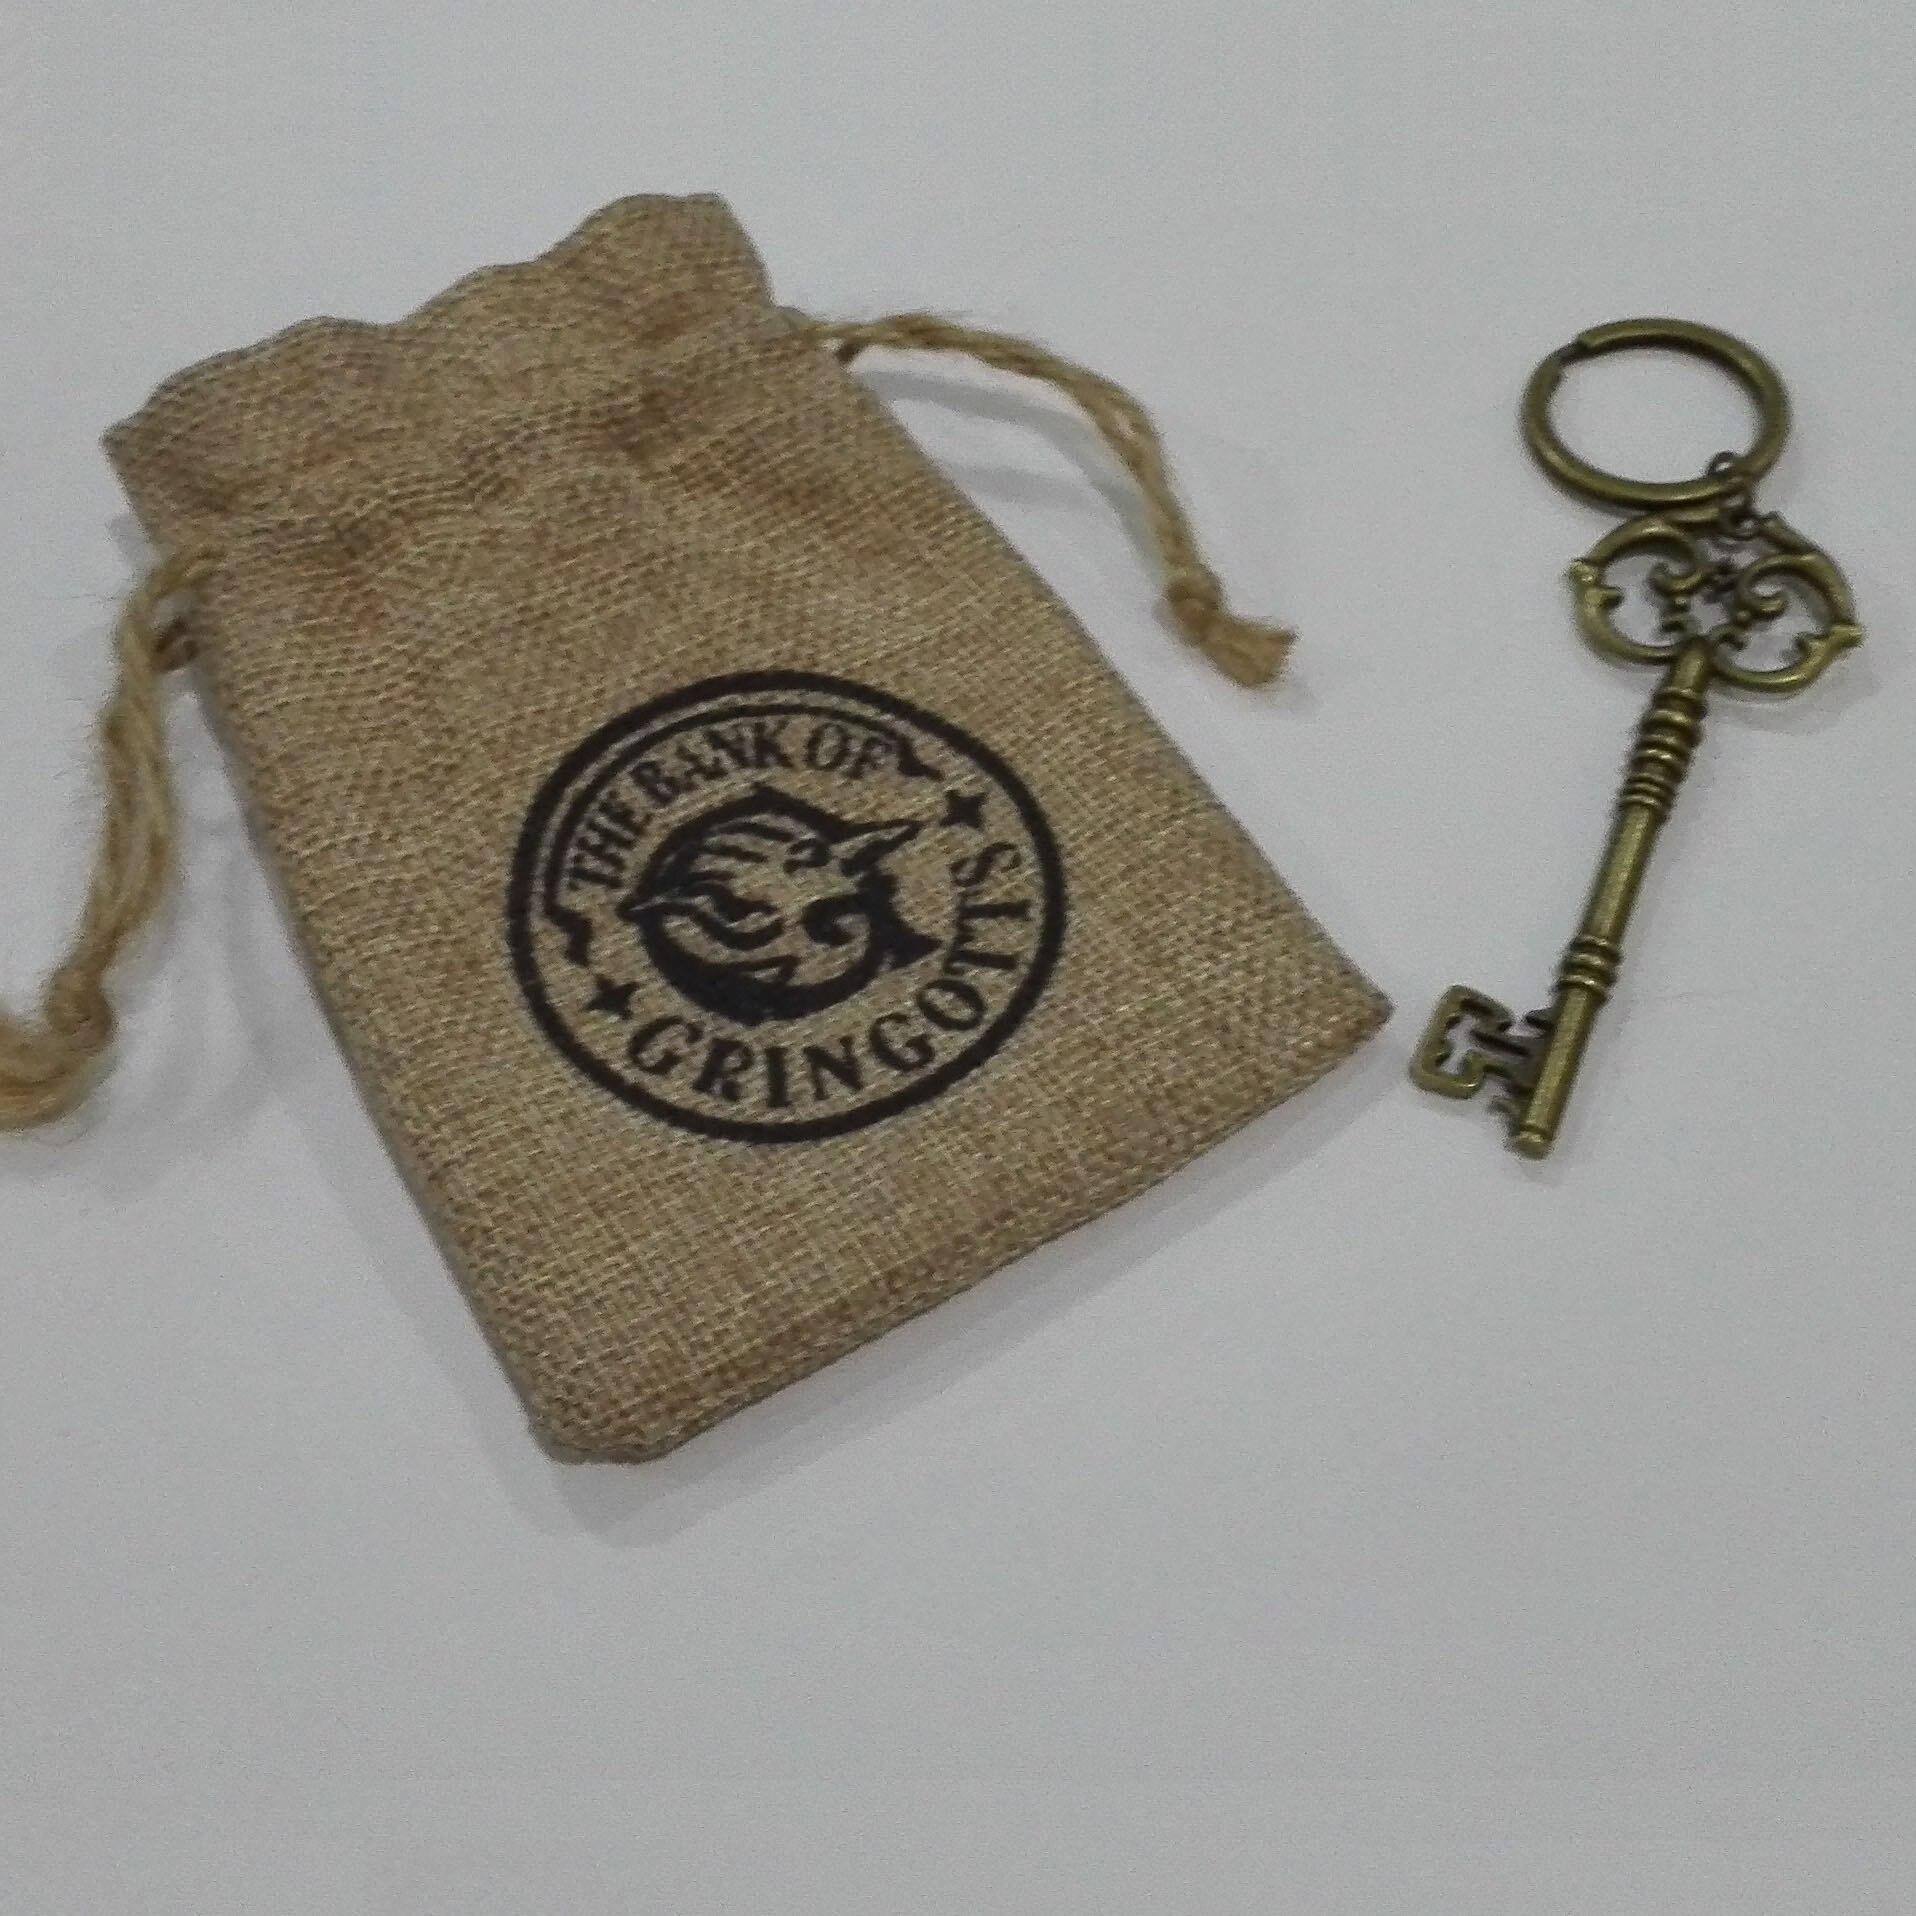 Gringotts Bank Wizarding Bank Key ahlloween Cosplay Accessory HP Collectible Children gift